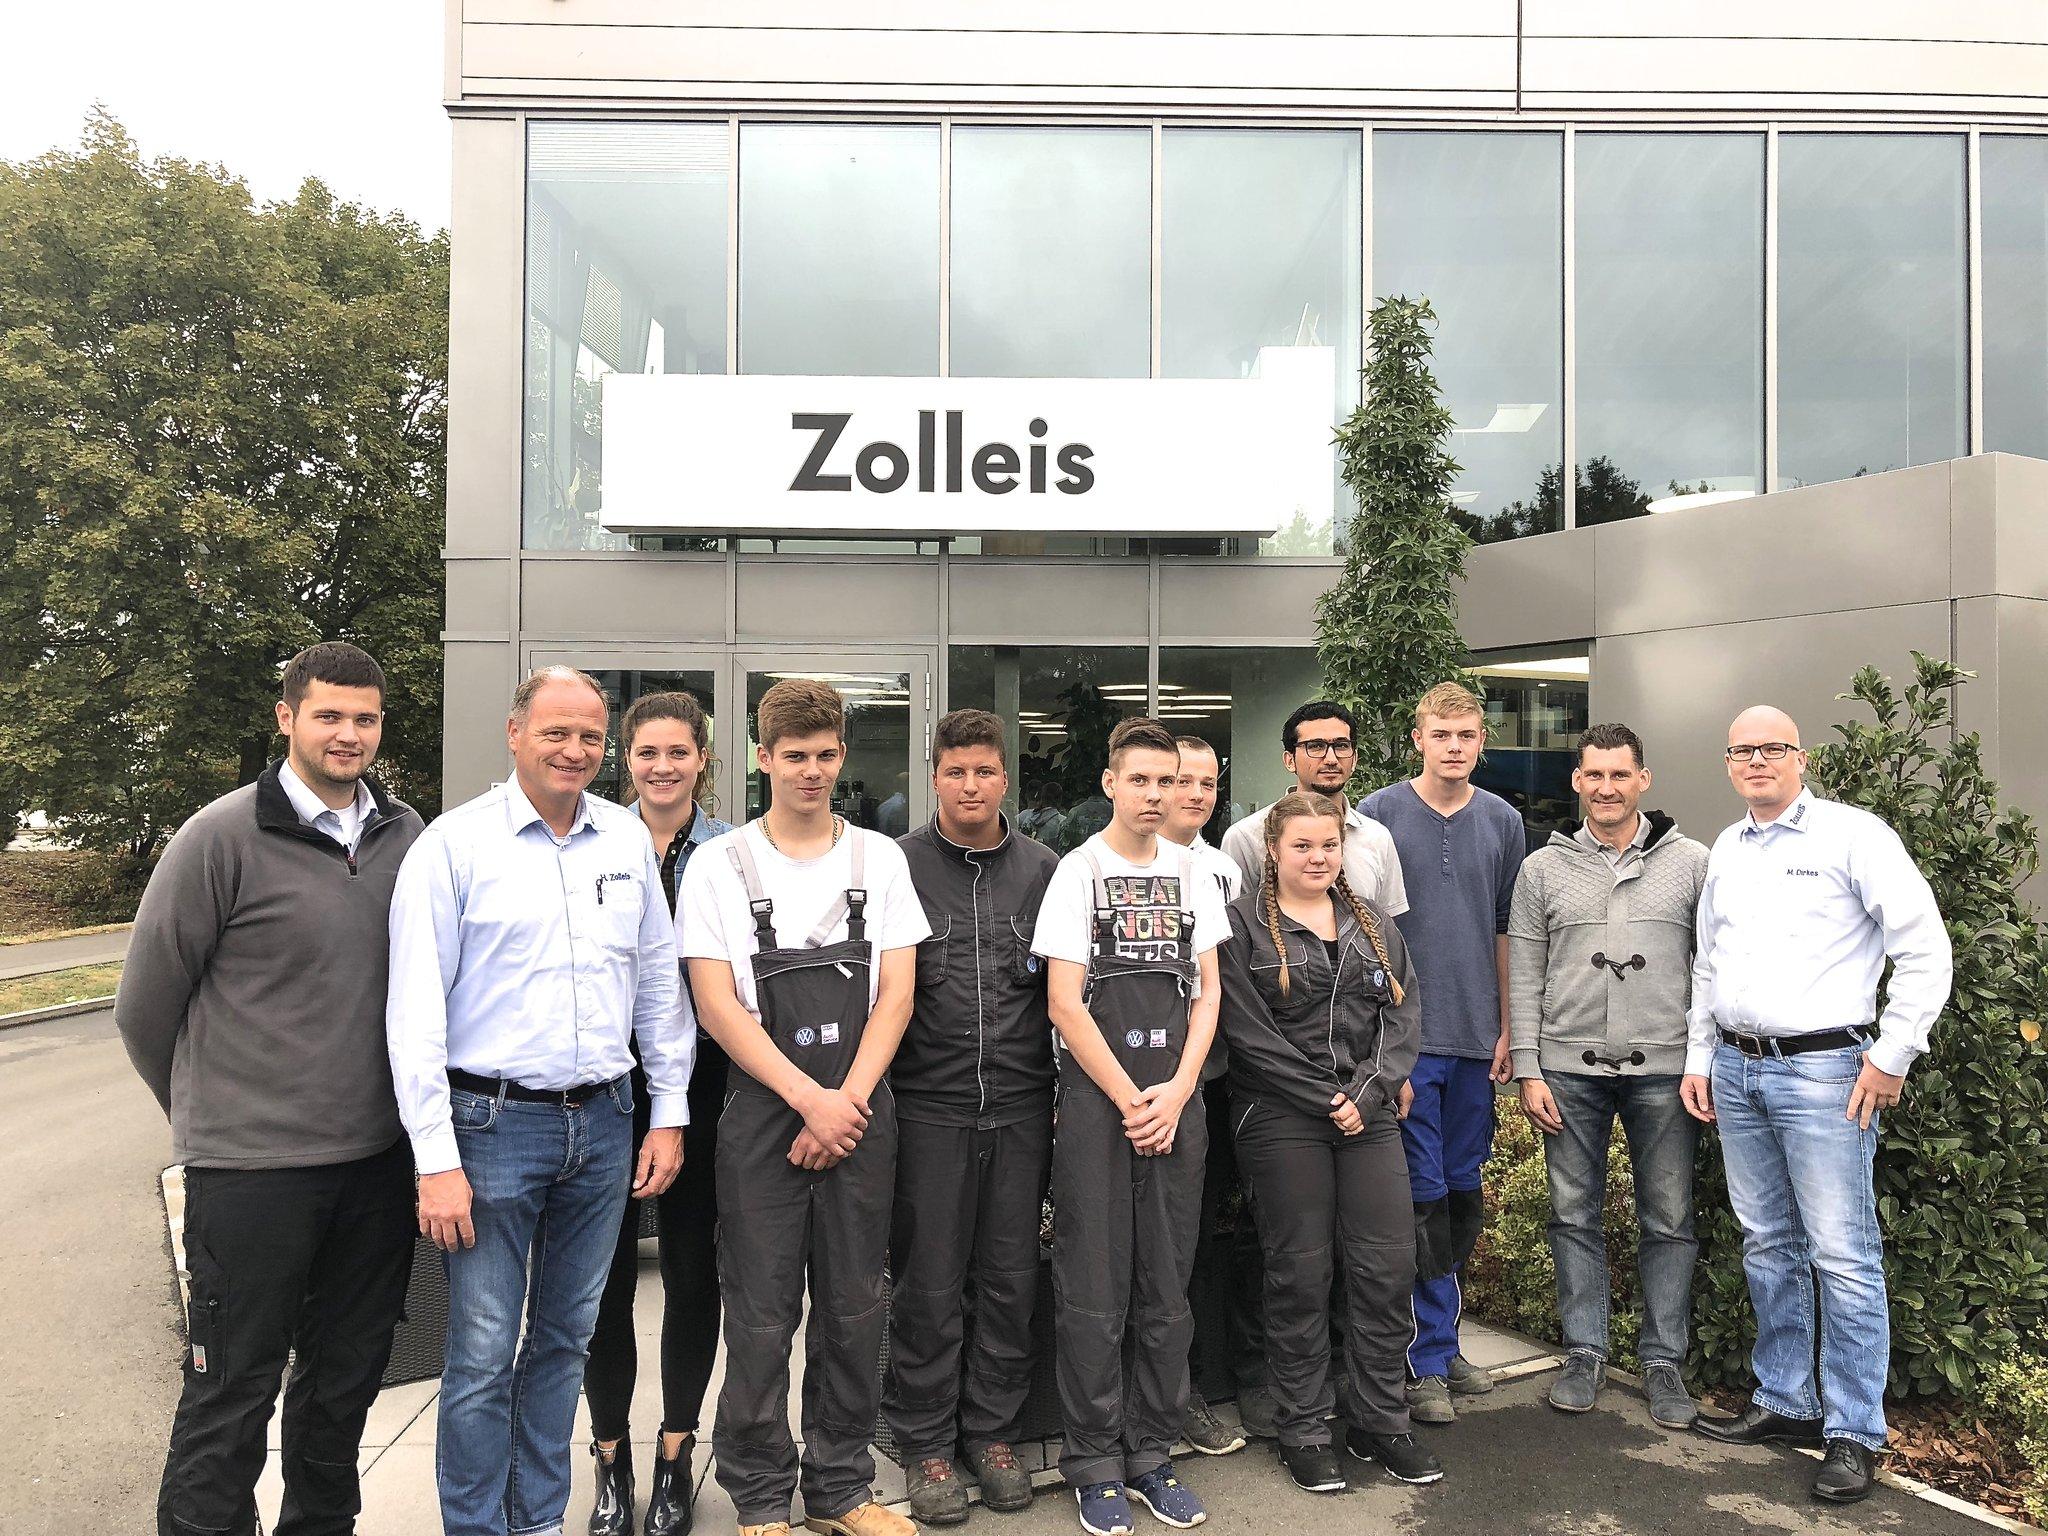 Zolleis Forchheim